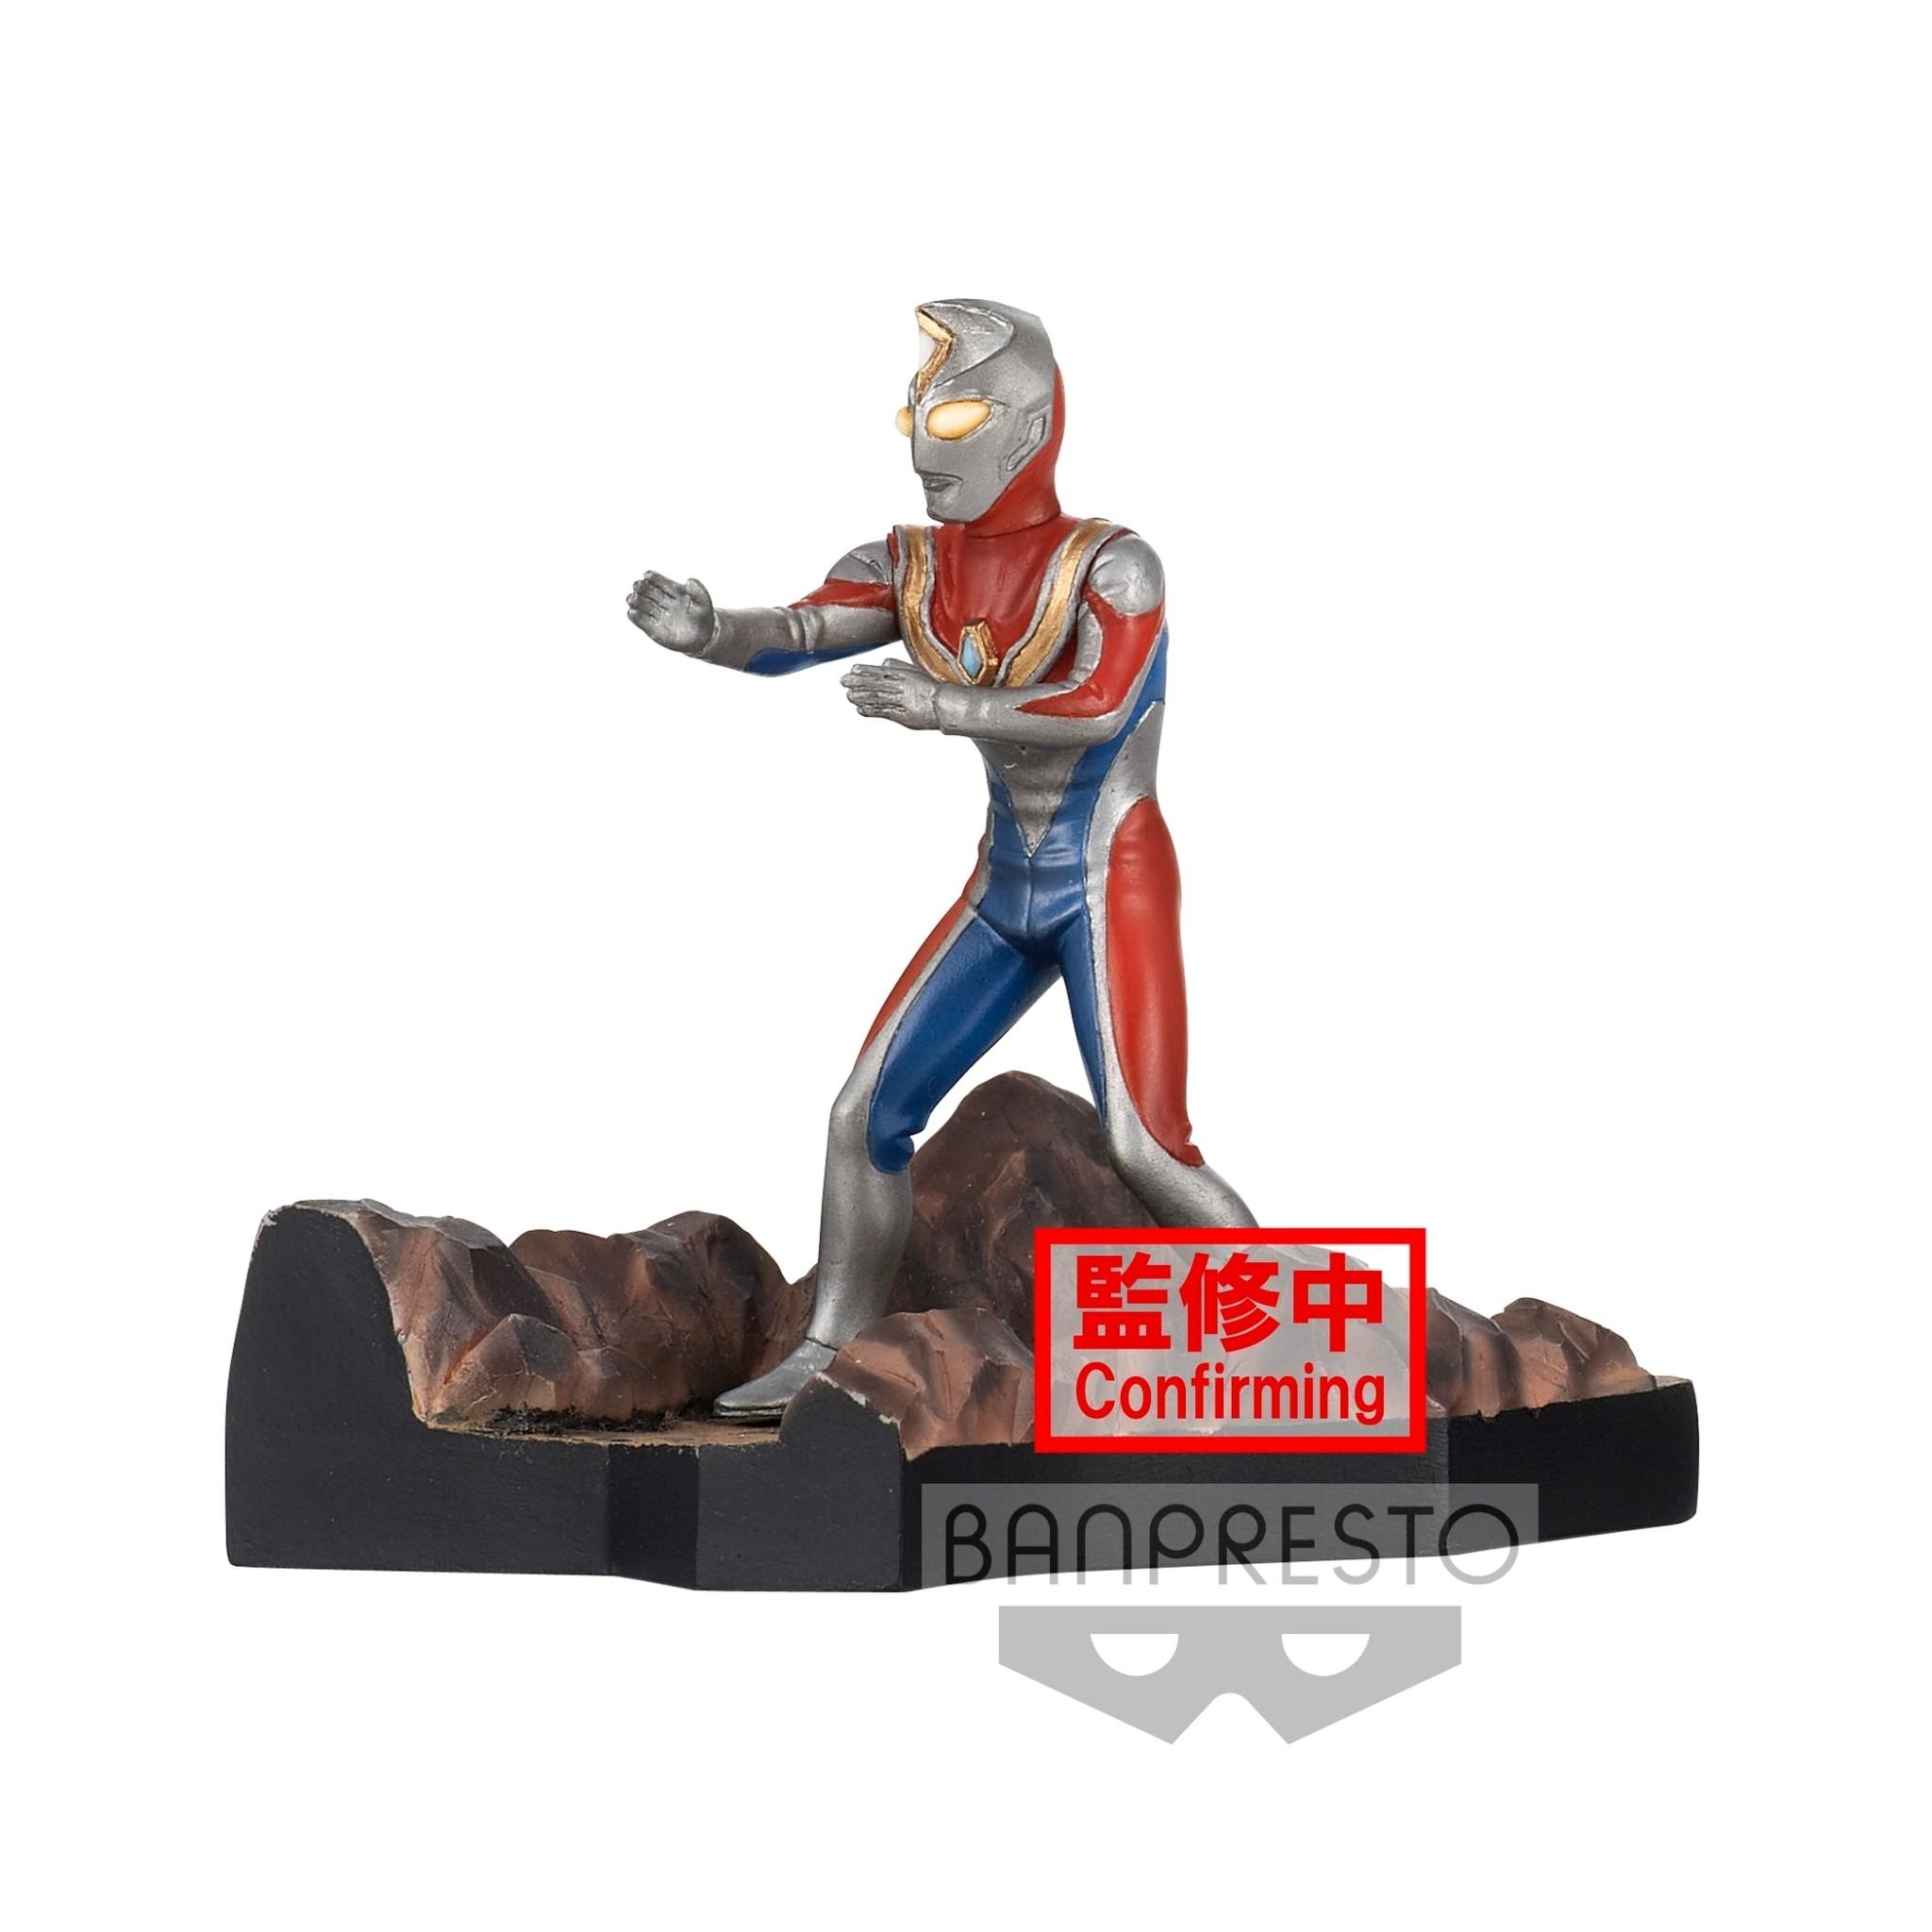 BANPRESTO 超人力霸王帝納 特攝STAGEMENT #49新的影子 (A:超人力霸王帝納)